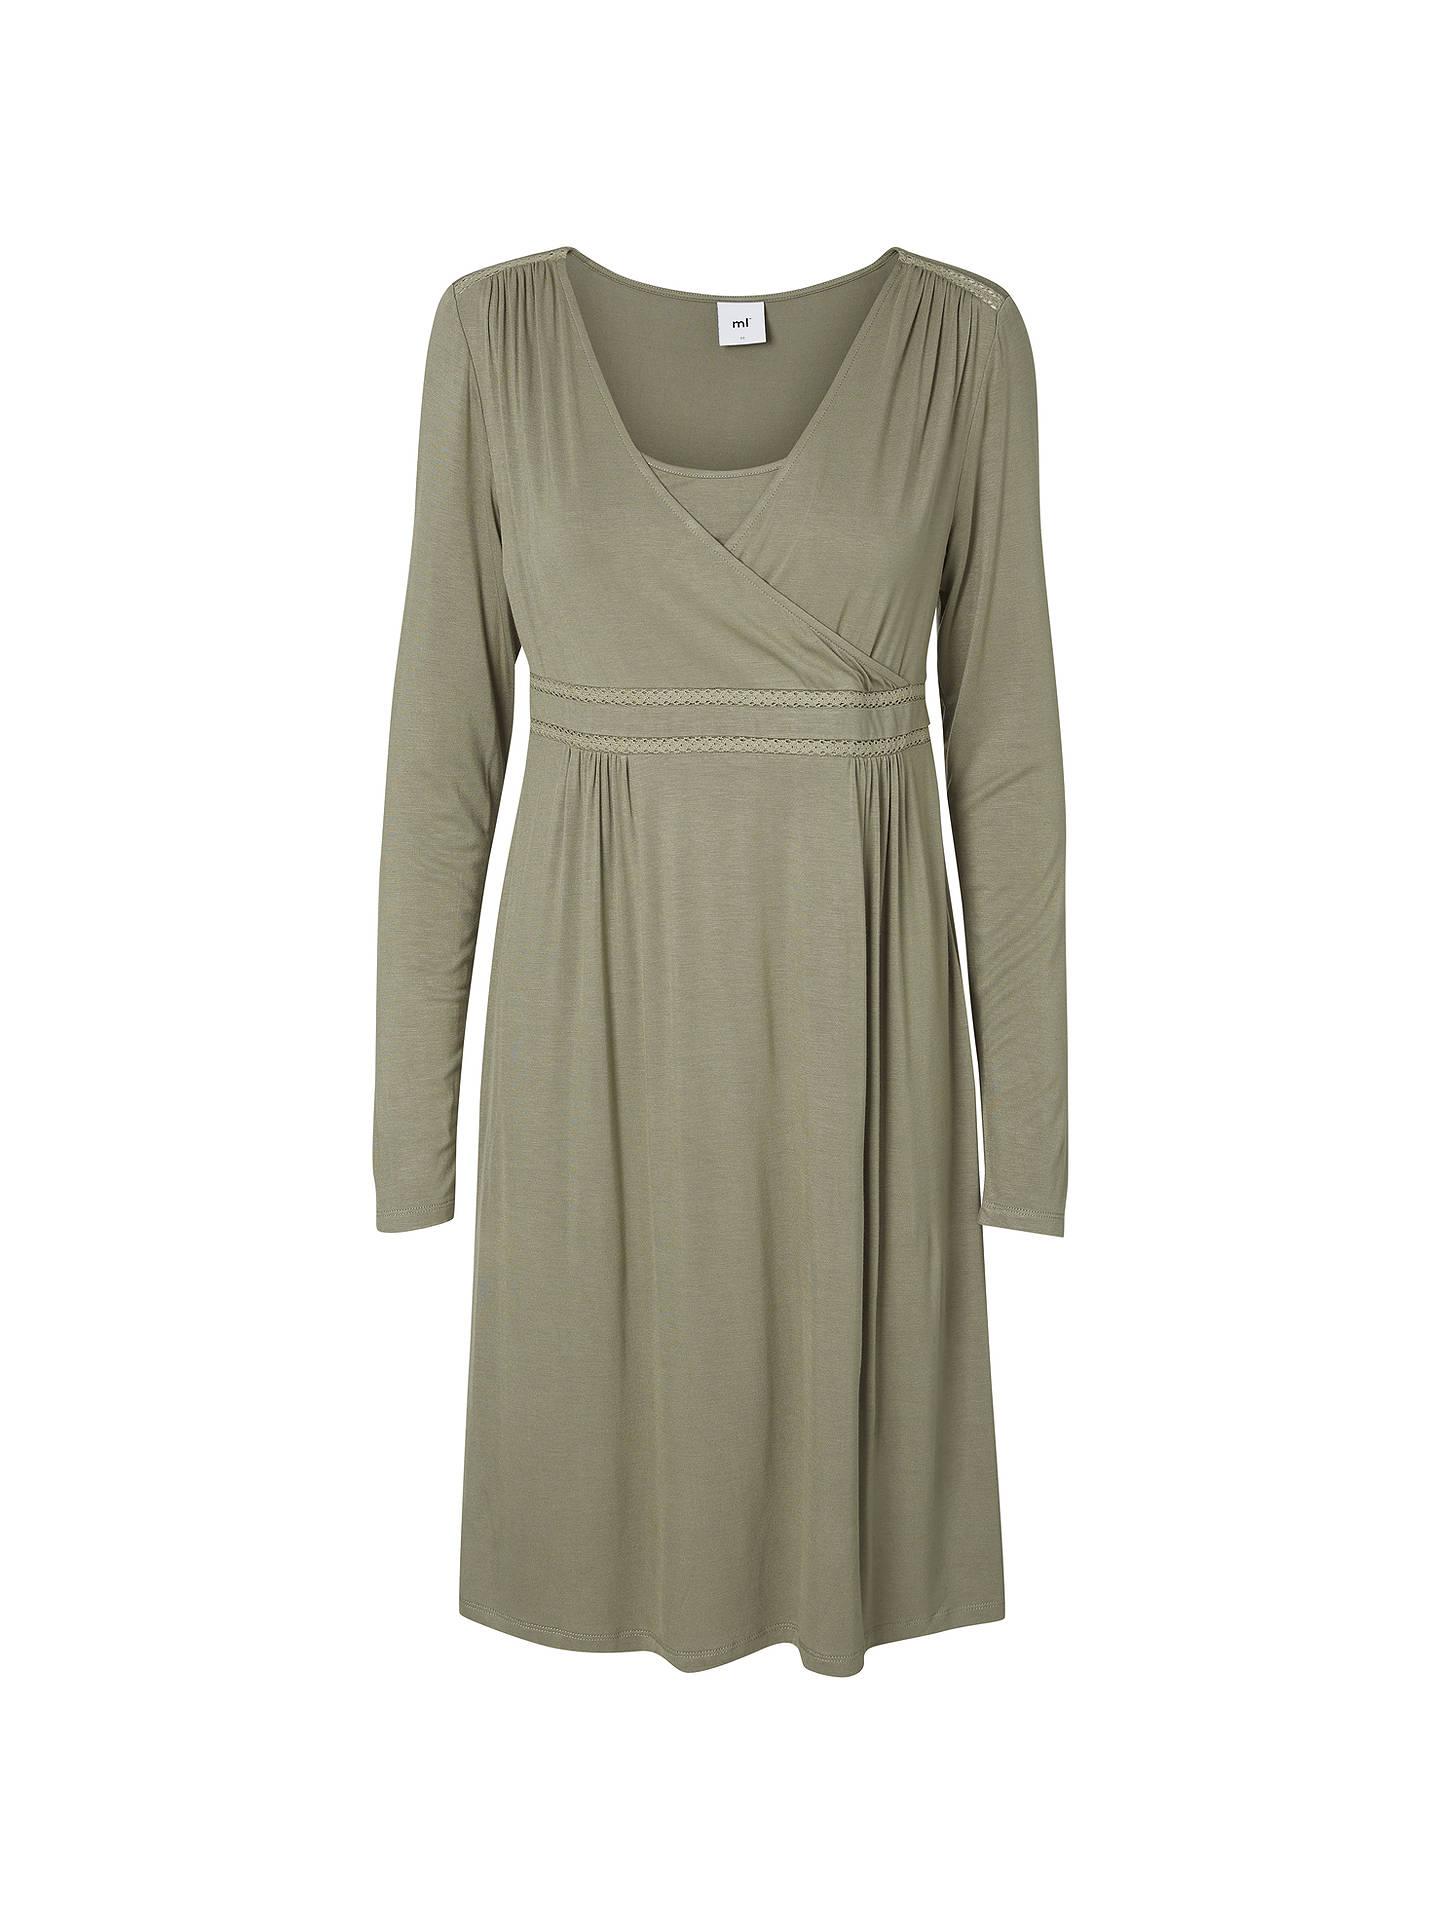 069e851ce87eb Buy Mamalicious Rikko Tess Maternity Nursing Dress, Vetiver Green, S Online  at johnlewis.